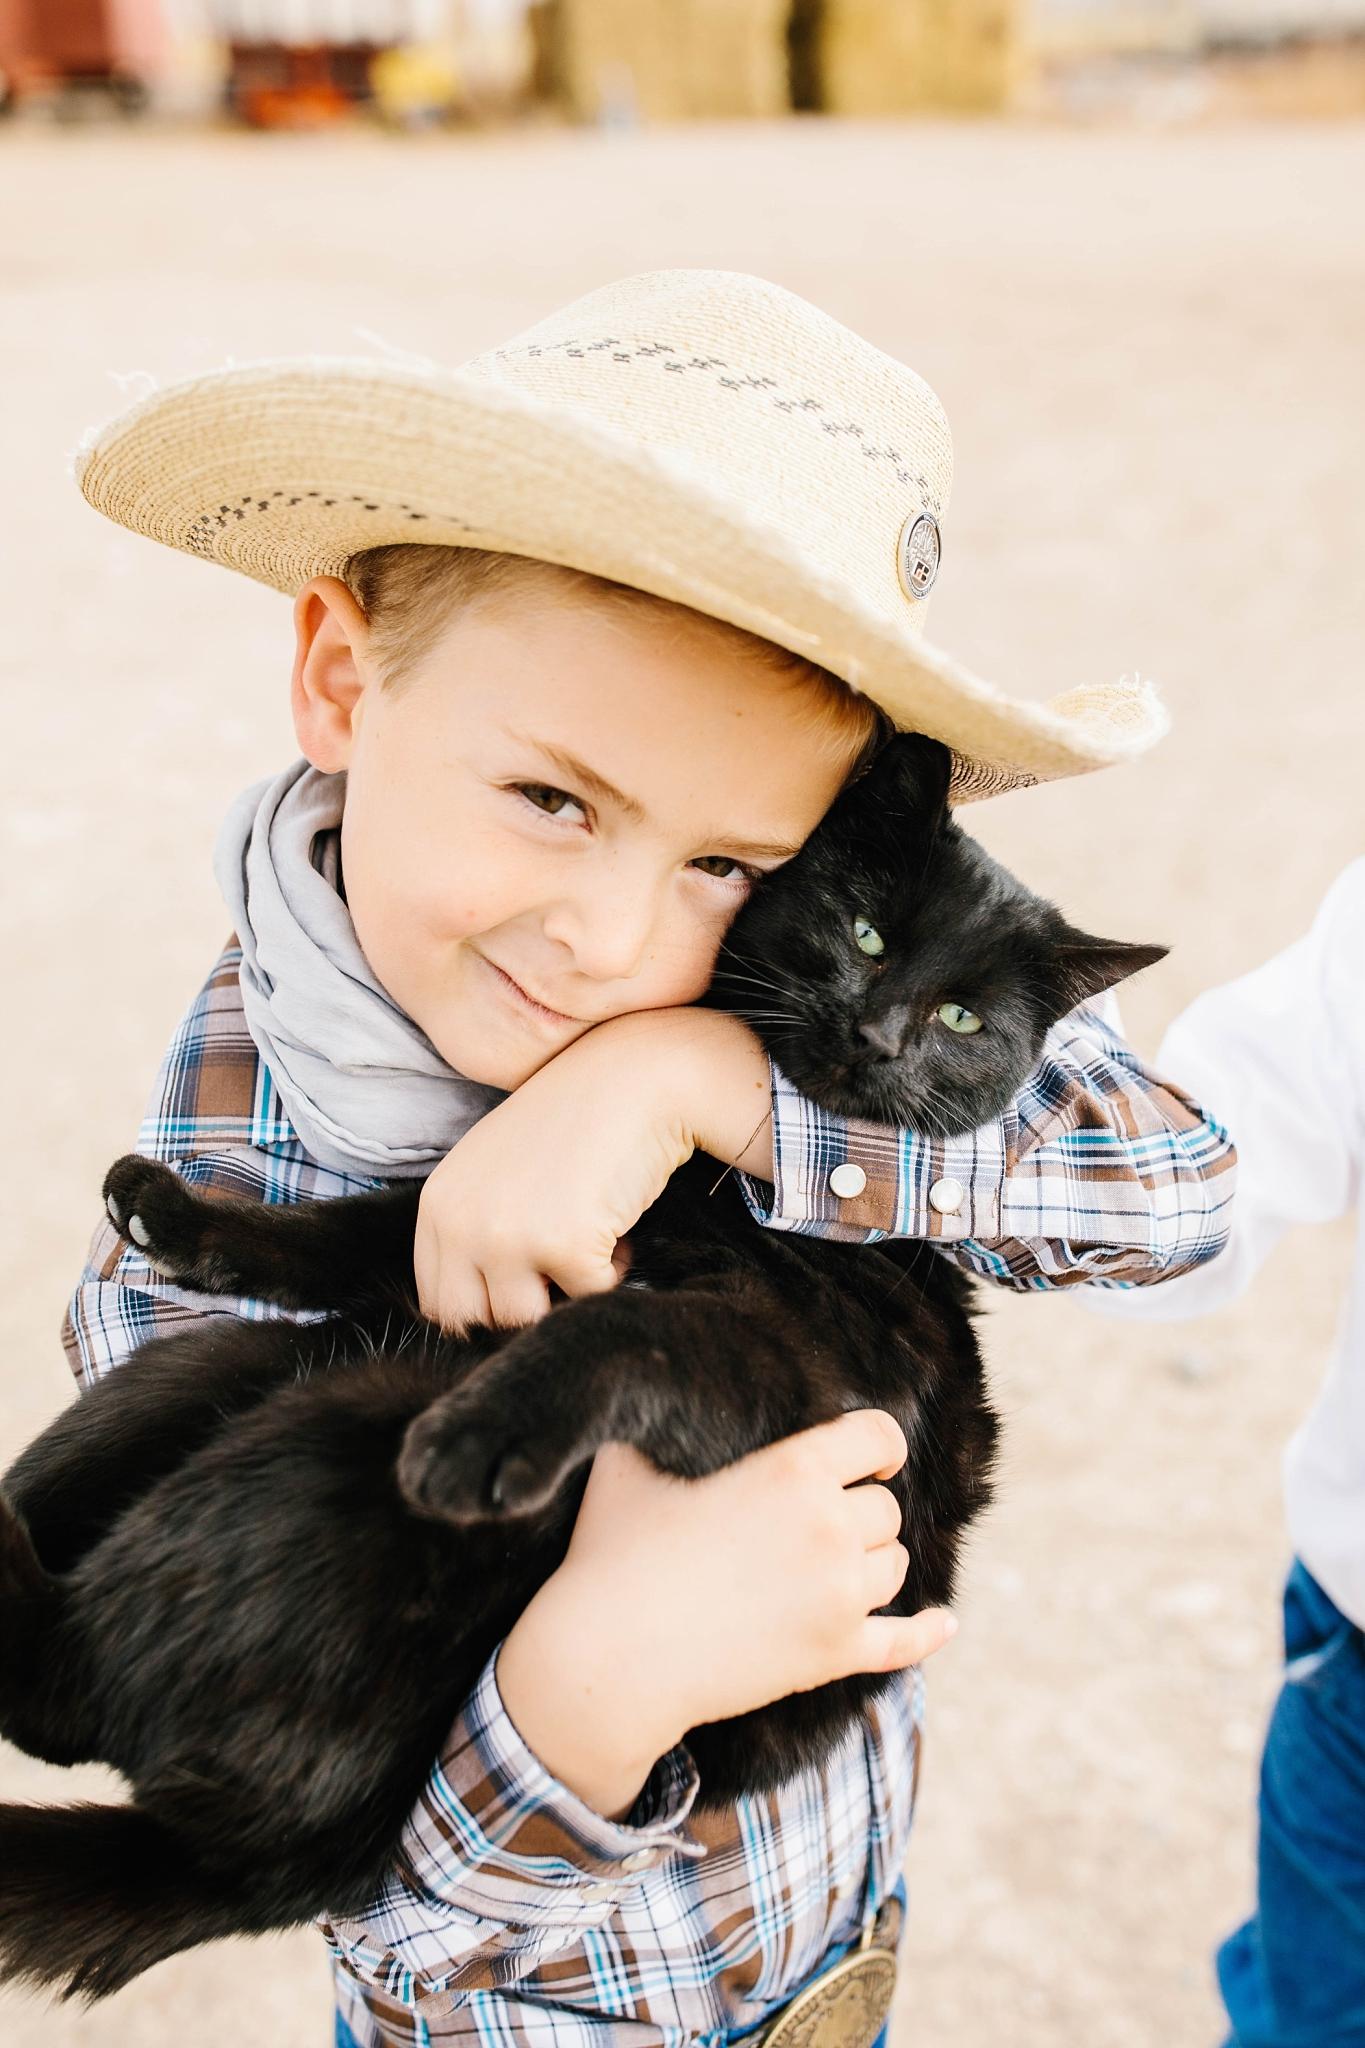 Lister-71_Lizzie-B-Imagery-Utah-Family-Photographer-Lifestyle-Photography-Salt-Lake-City-Park-City-Utah-County-Farm-Family-Session.jpg